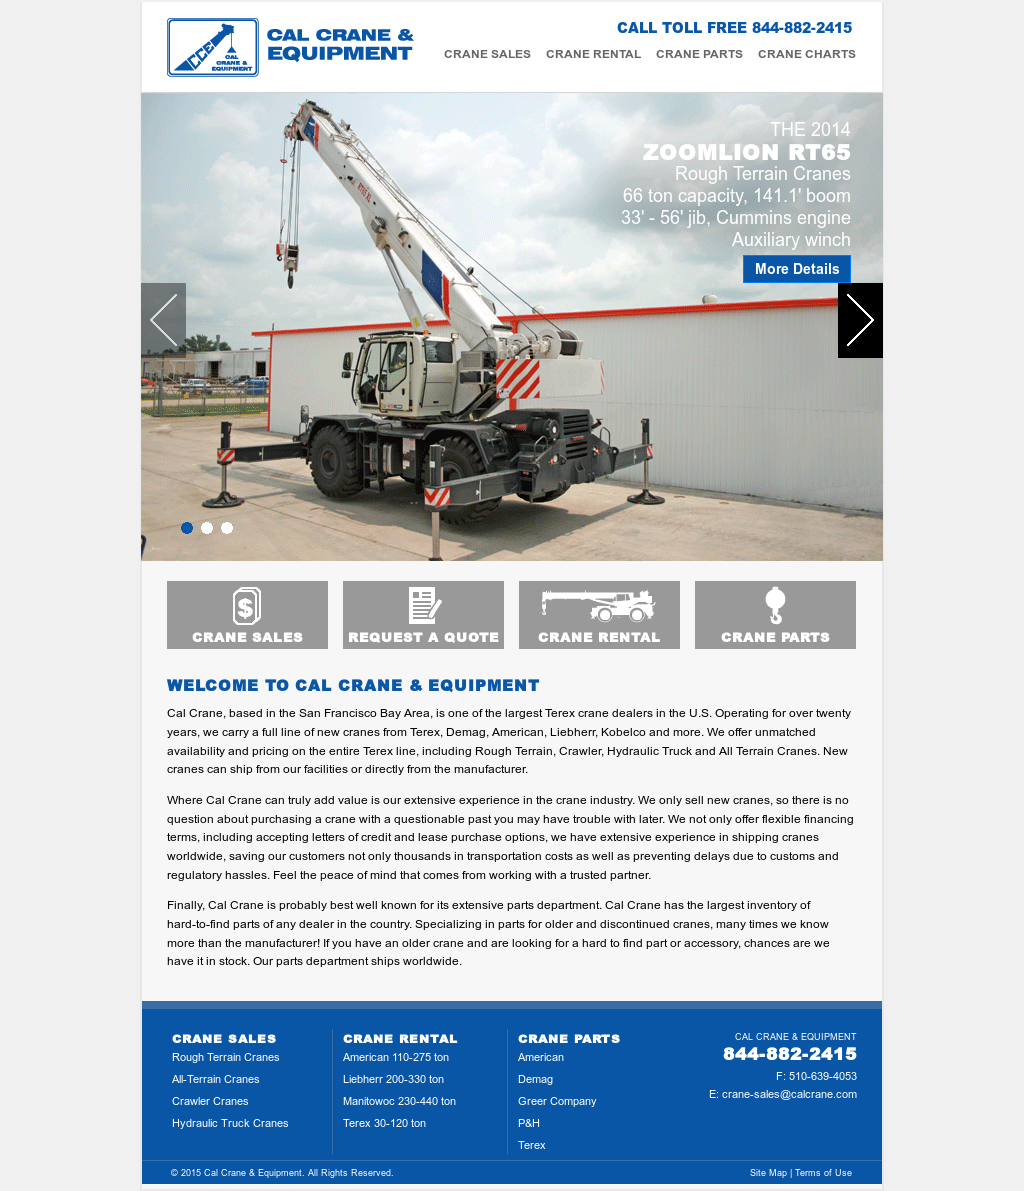 Cal Crane & Equipment Competitors, Revenue and Employees